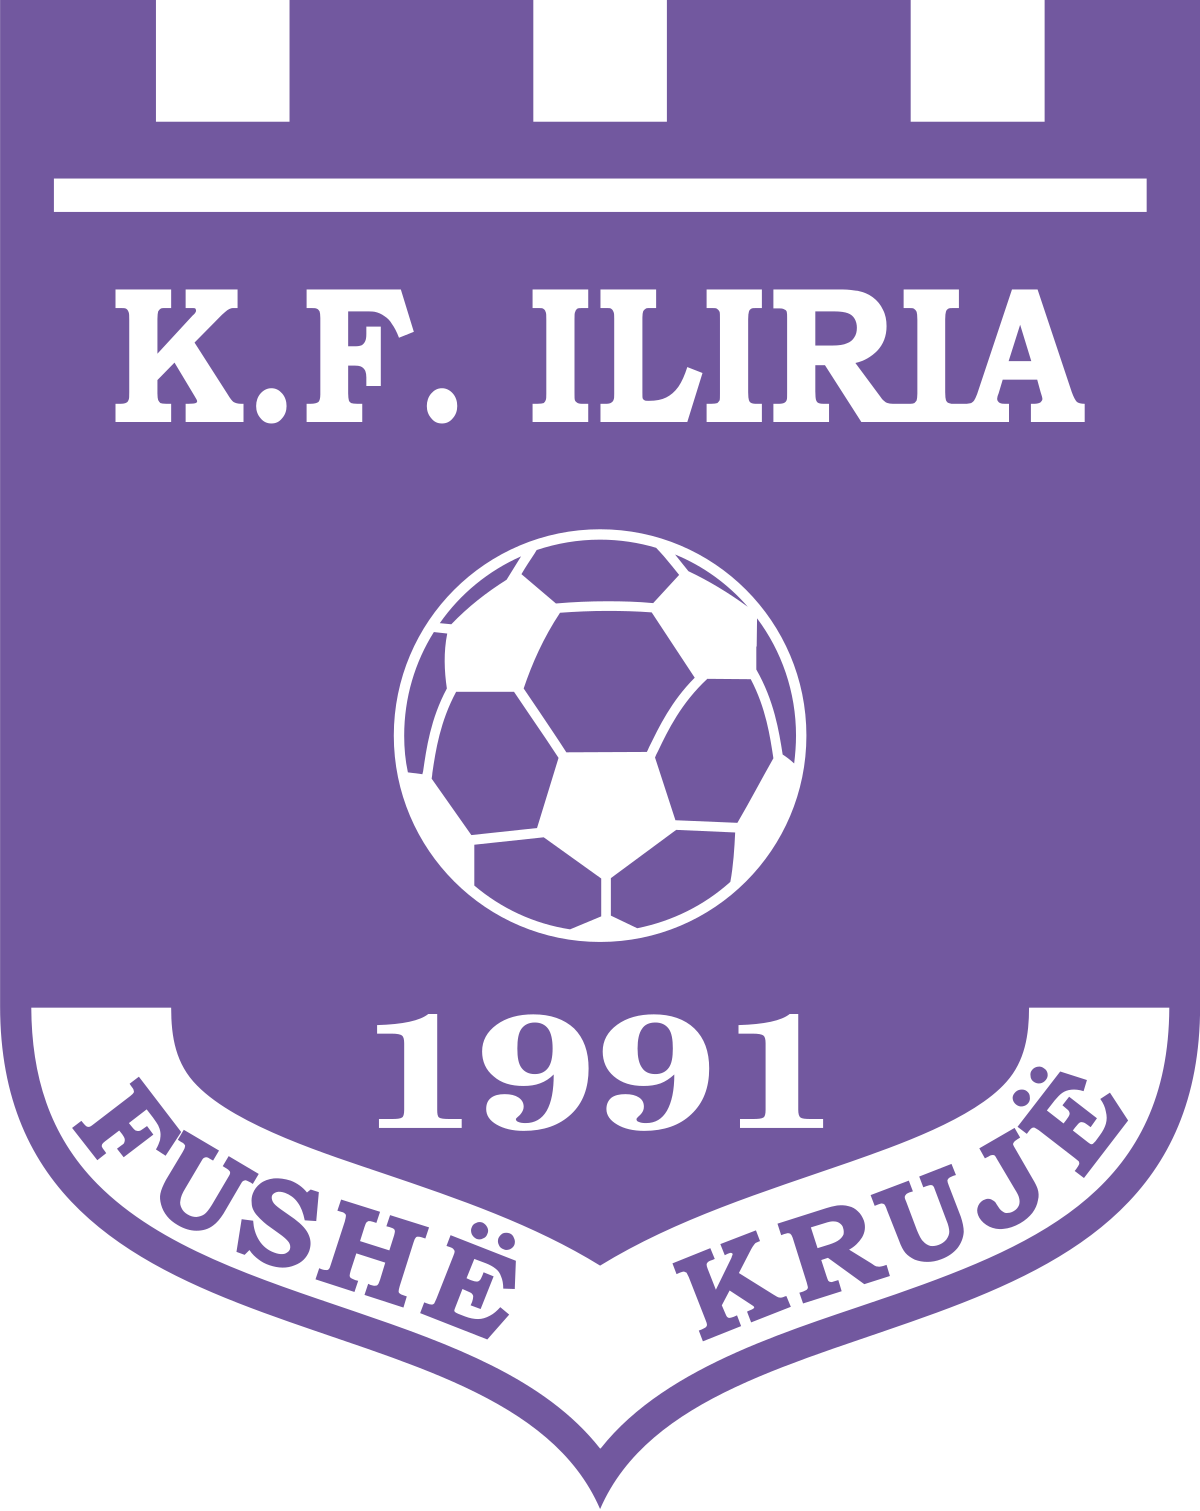 Iliria Fushe Kruje logo